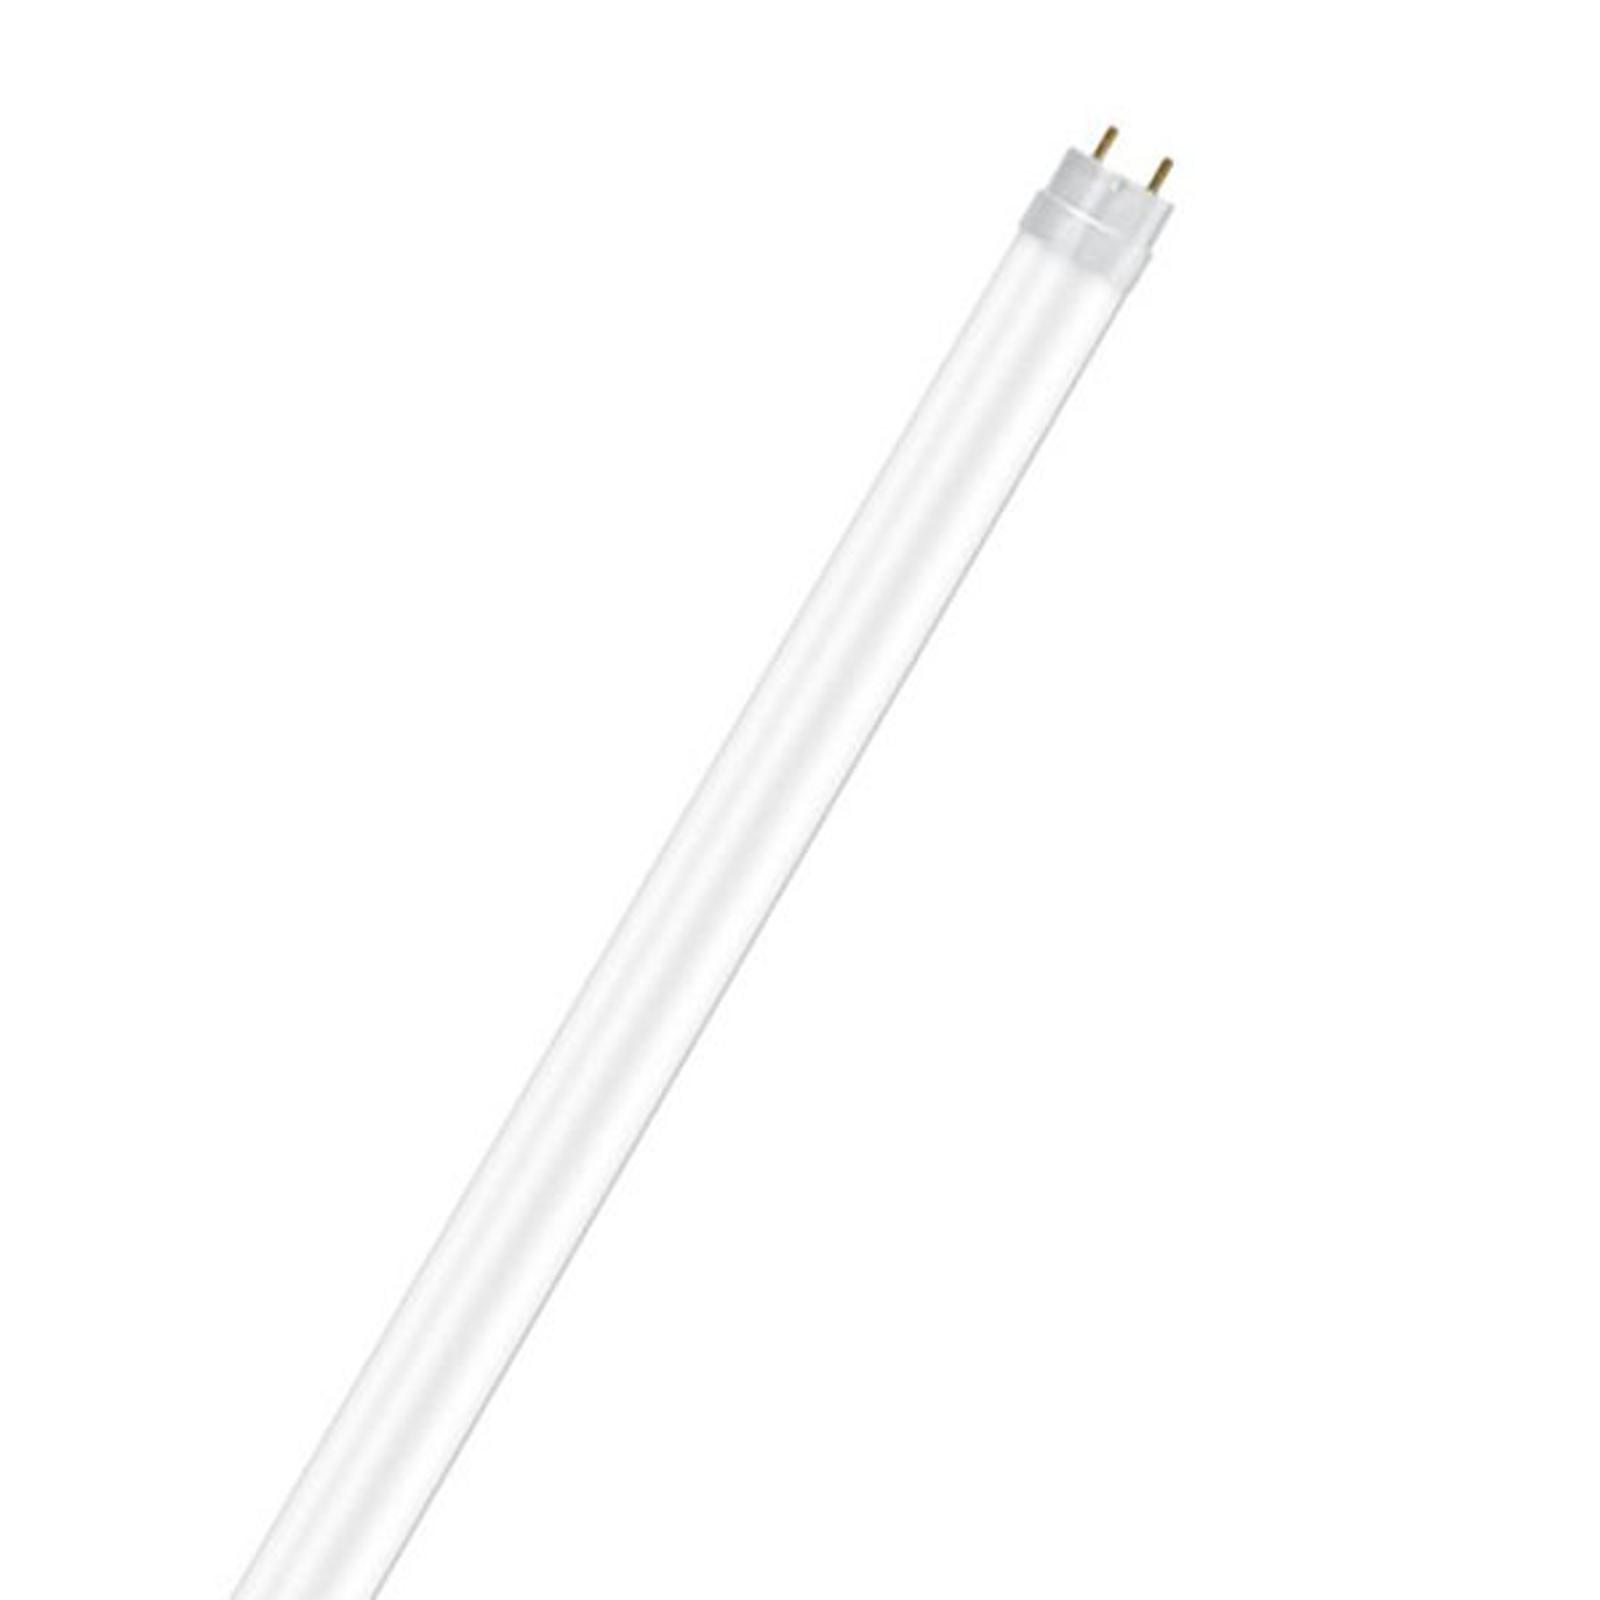 OSRAM-LED-putki G13 150cm SubstiTUBE PC 20W 4000 K